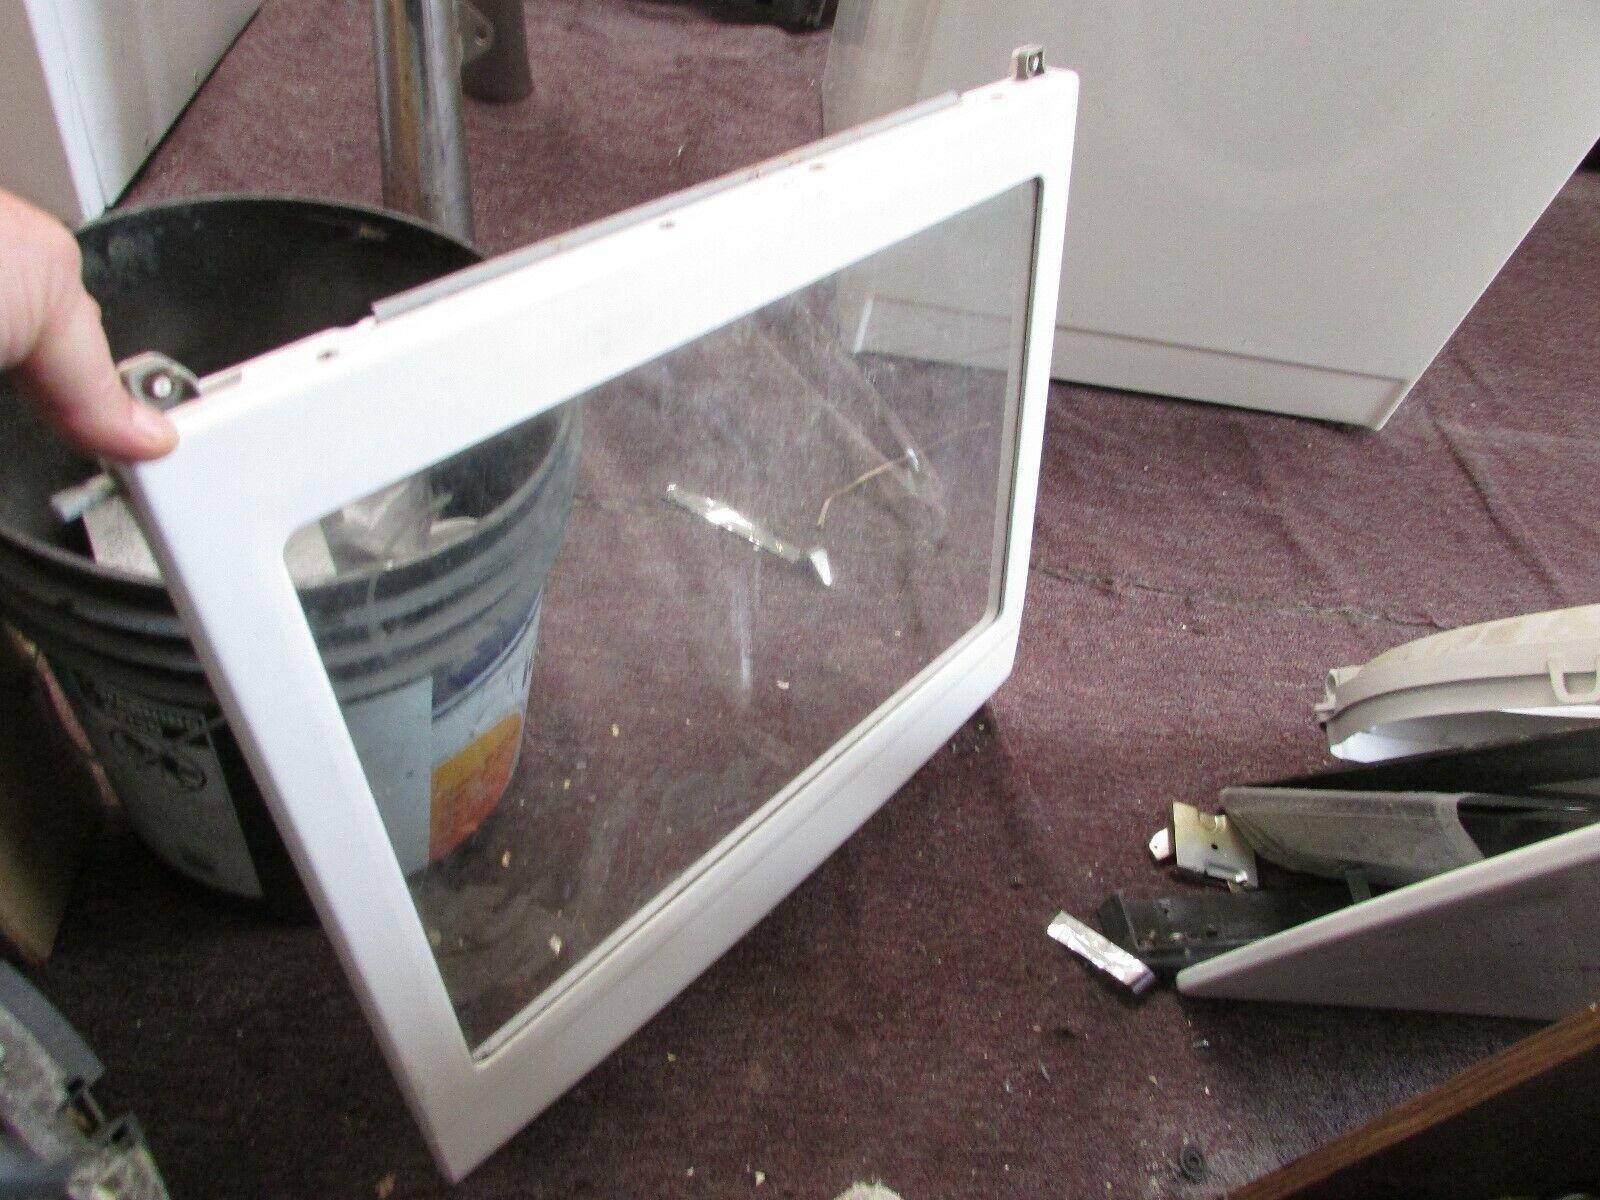 Samsung Washer Door ASM DC97-16762B